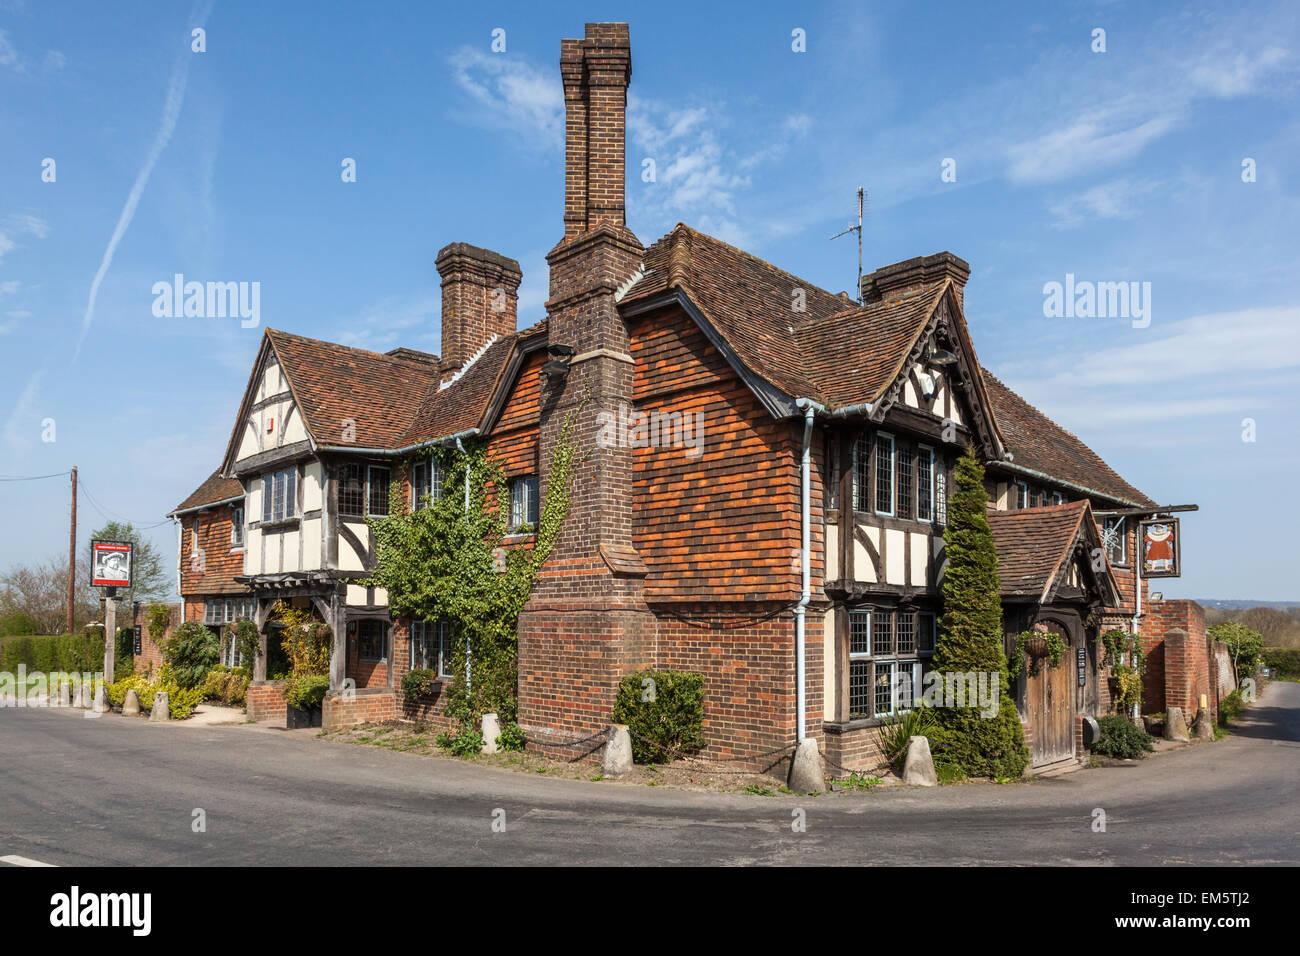 the king henry viii pub in hever kent uk stock photo. Black Bedroom Furniture Sets. Home Design Ideas